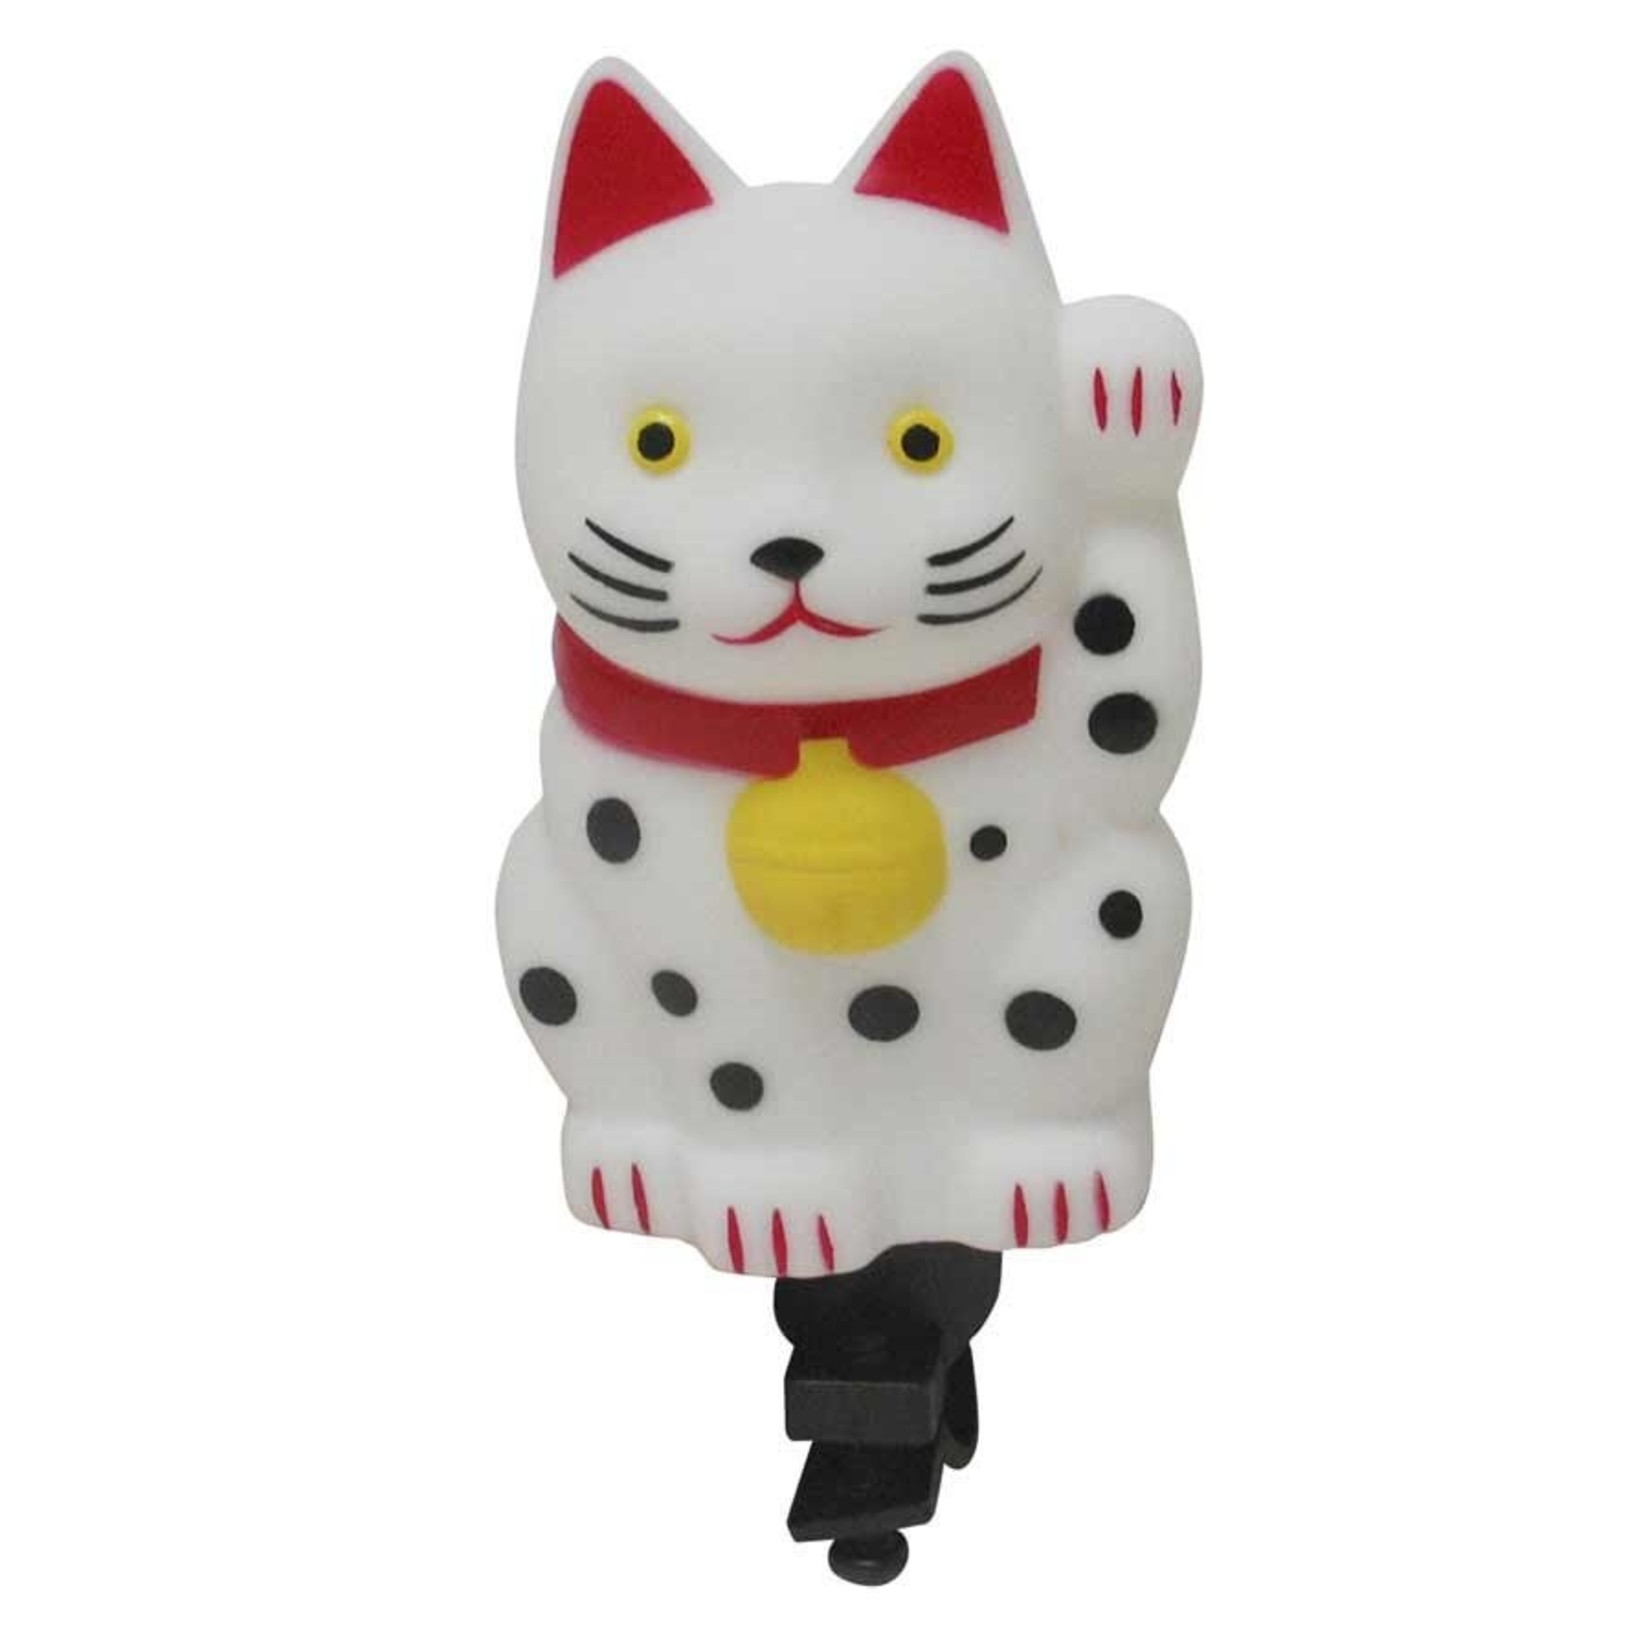 Evo EVO Squeezable Animal Horn, Cat